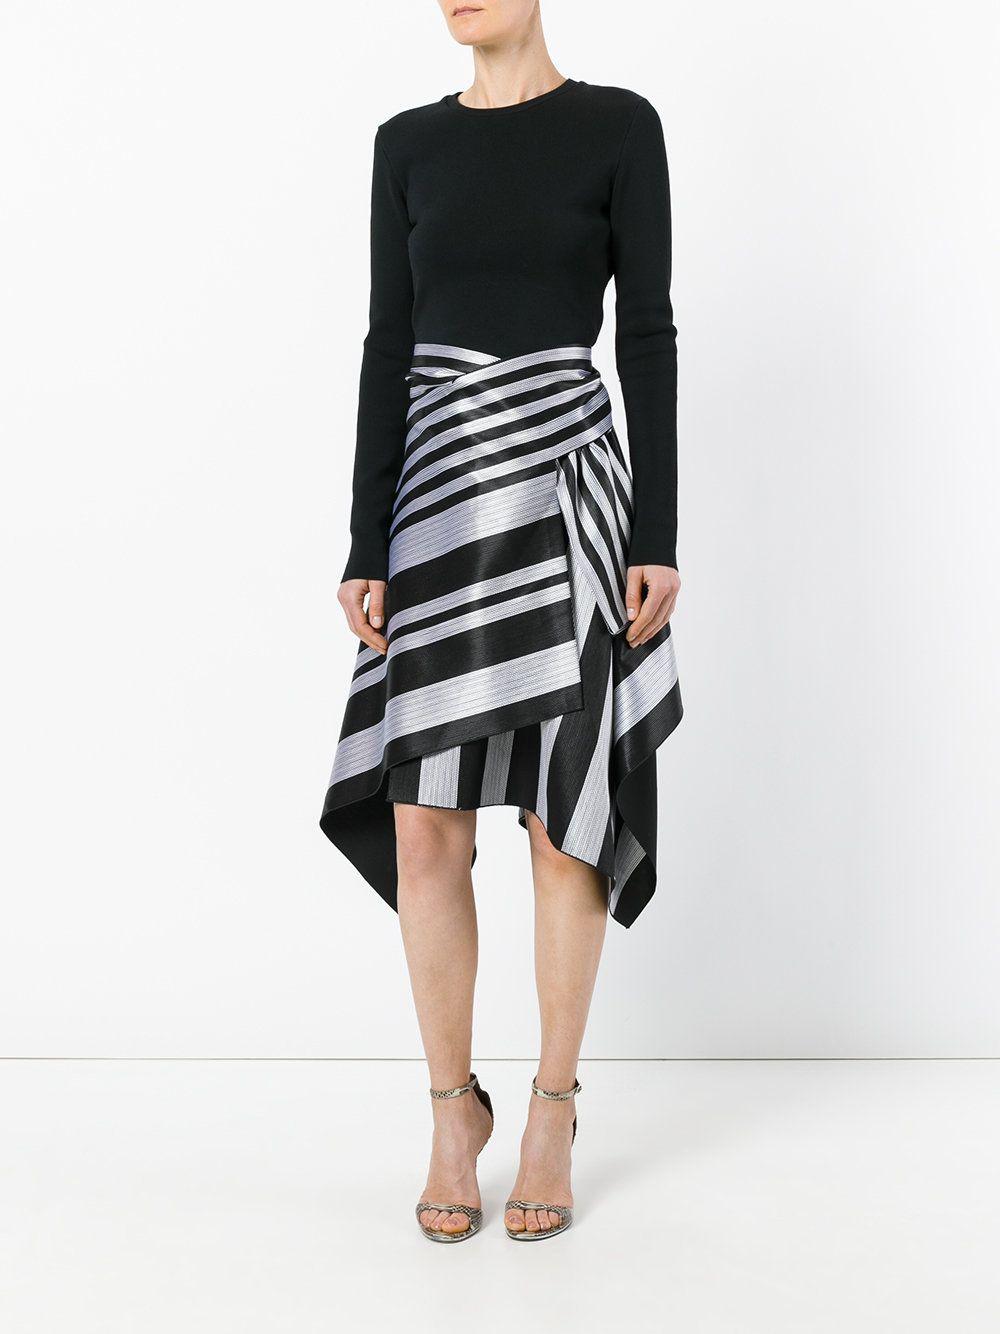 53145f0a60 Proenza Schouler falda asimétrica a rayas Falda Asimétrica